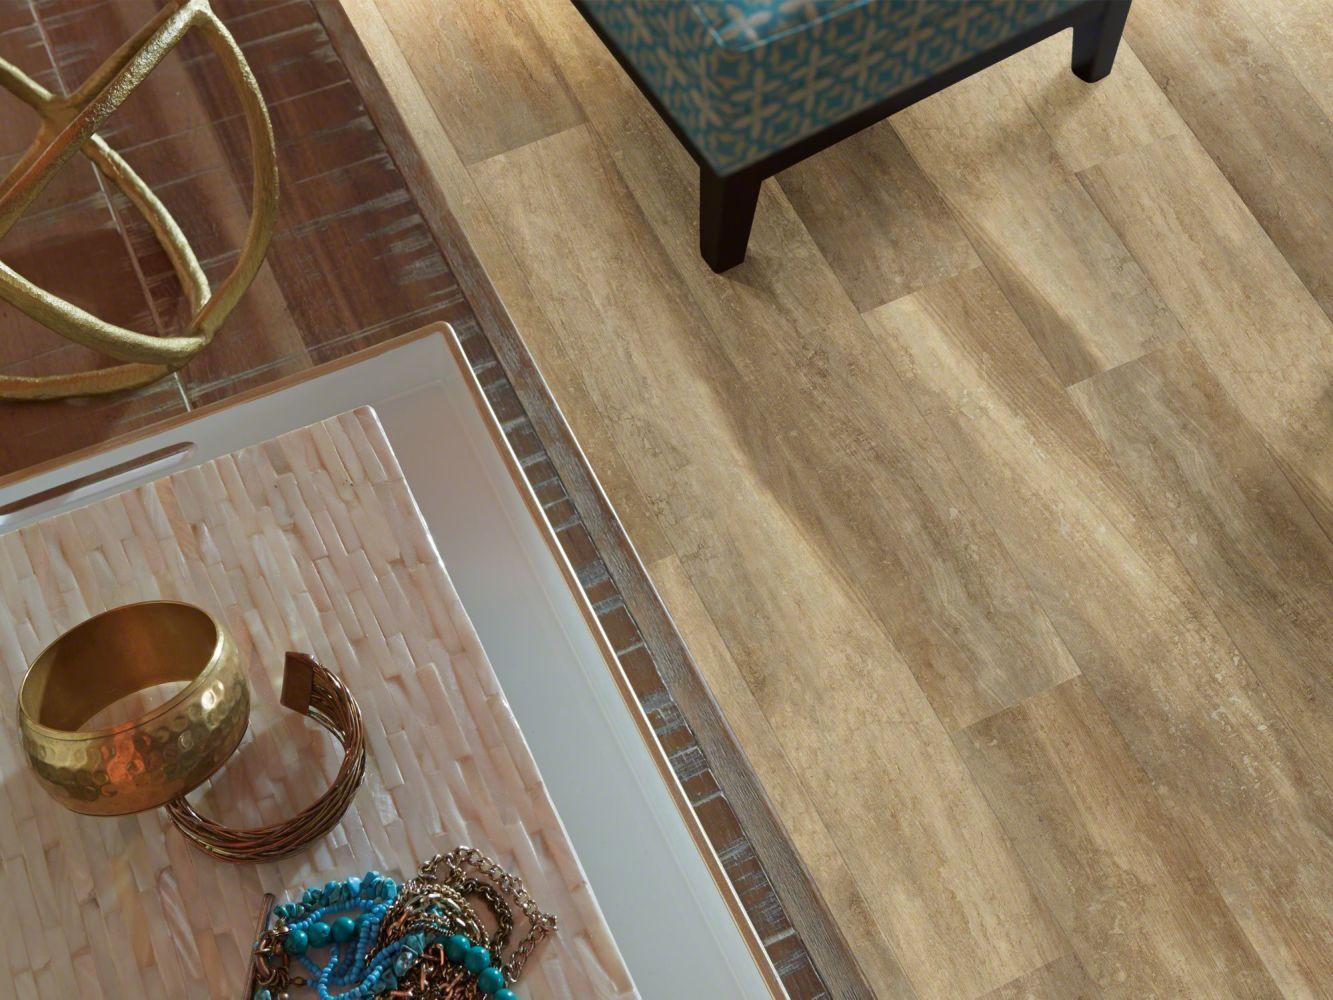 Shaw Floors Nfa HS Ventura Tan Oak 00765_VH542